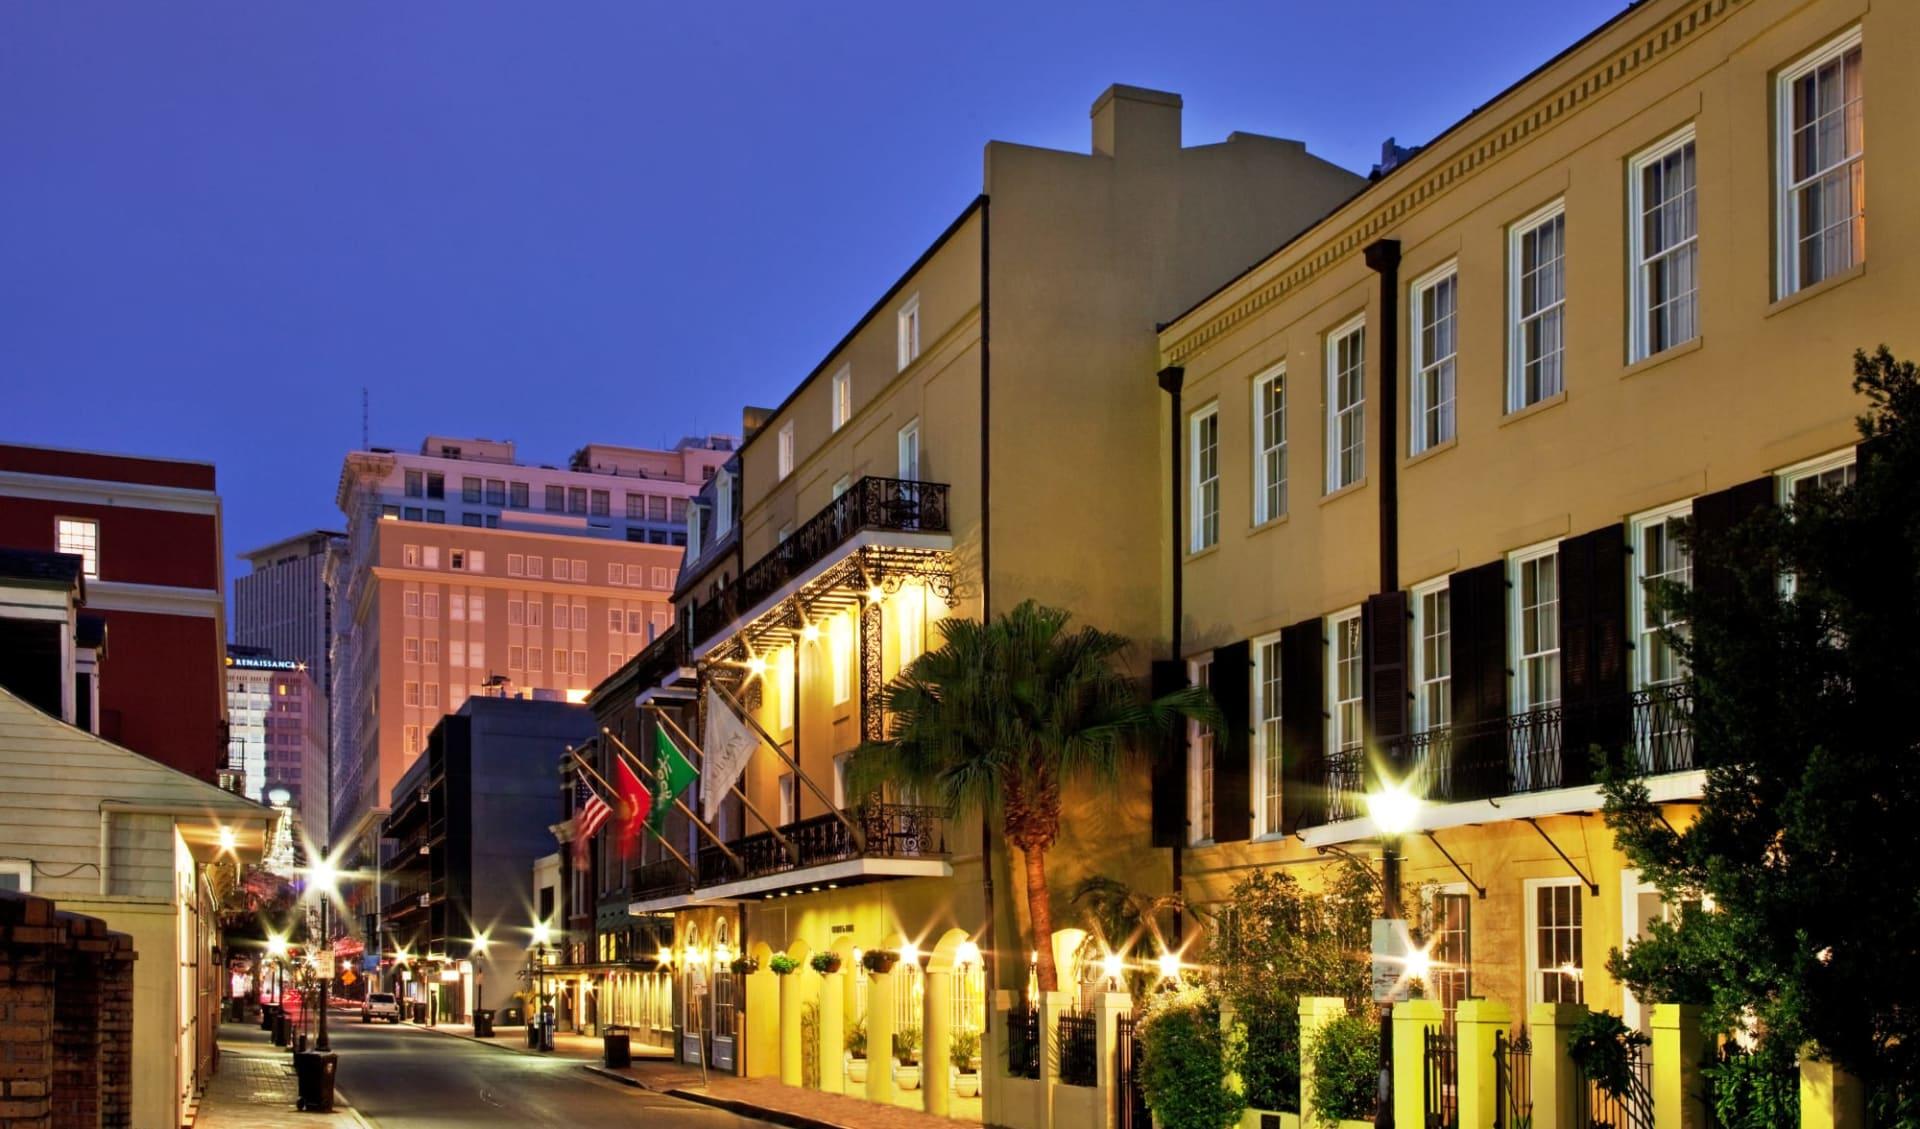 Chateau LeMoyne French Quarter A Holiday Inn Hotel in New Orleans:  Holiday Inn Château LeMoyne - View at night